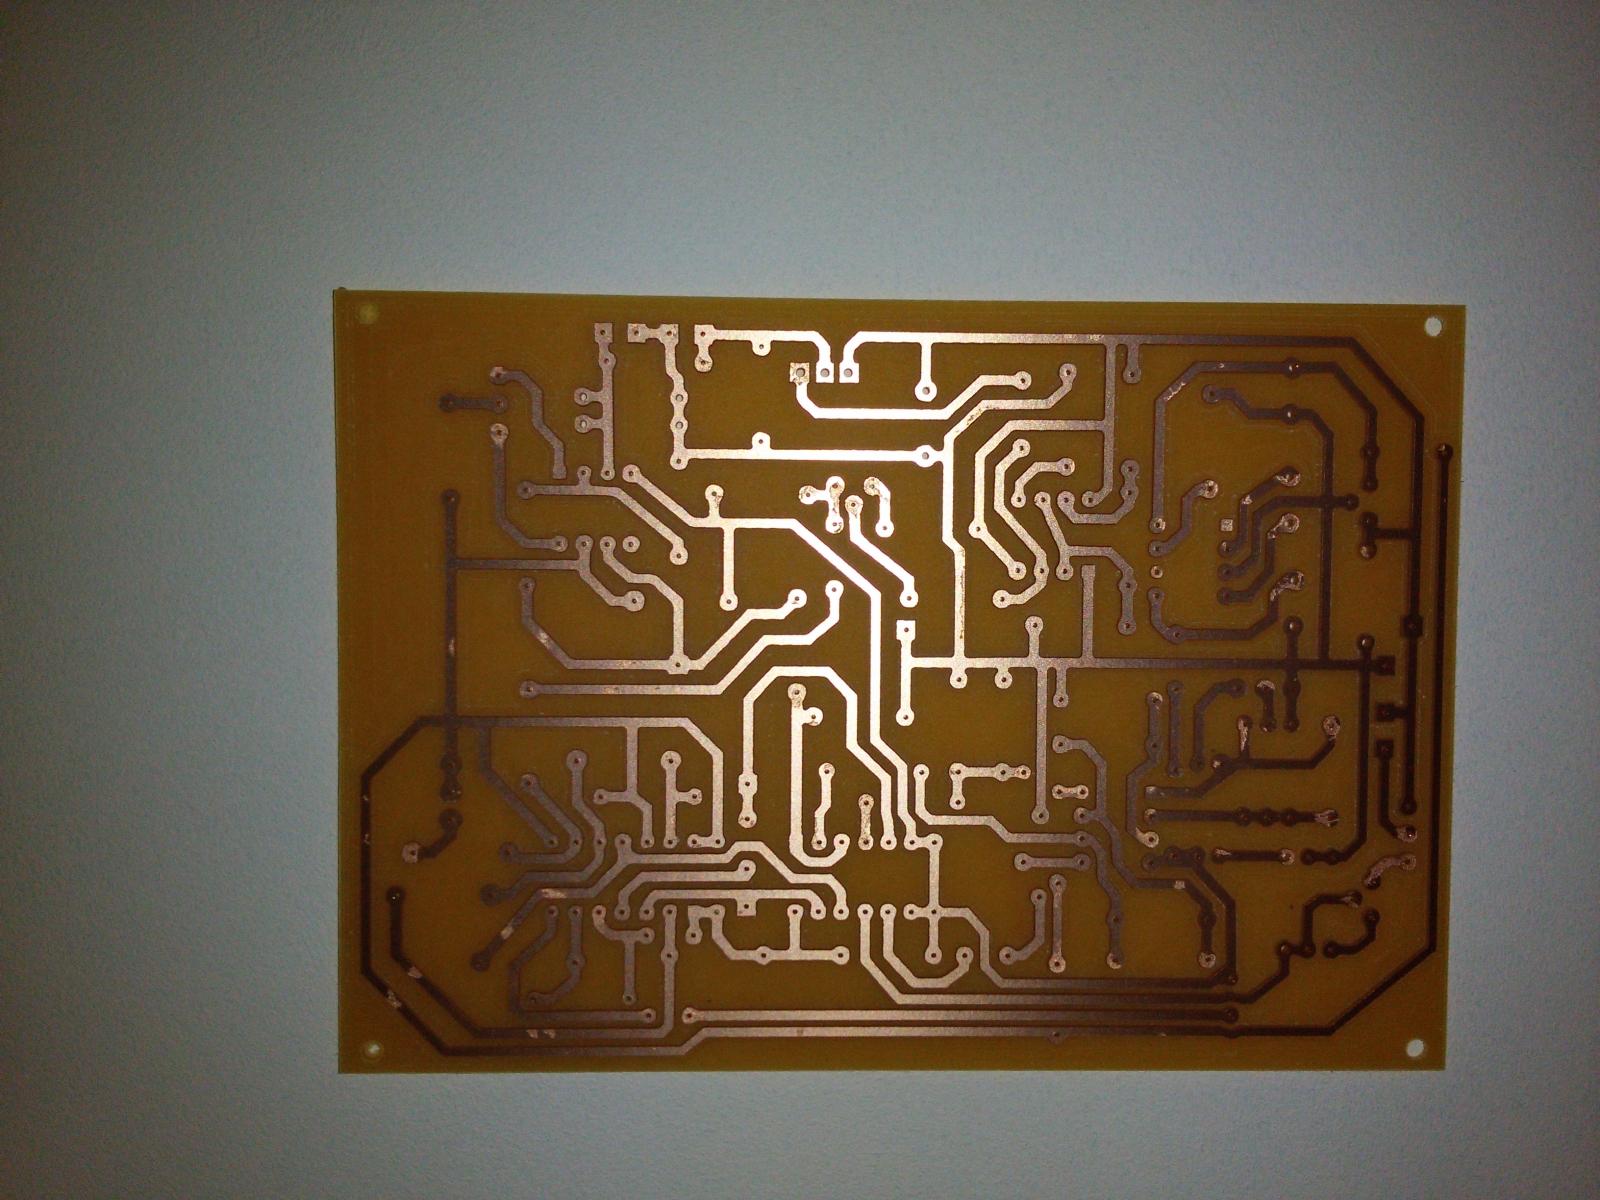 Detector Surf Pi. - Página 9 2w1xgtk